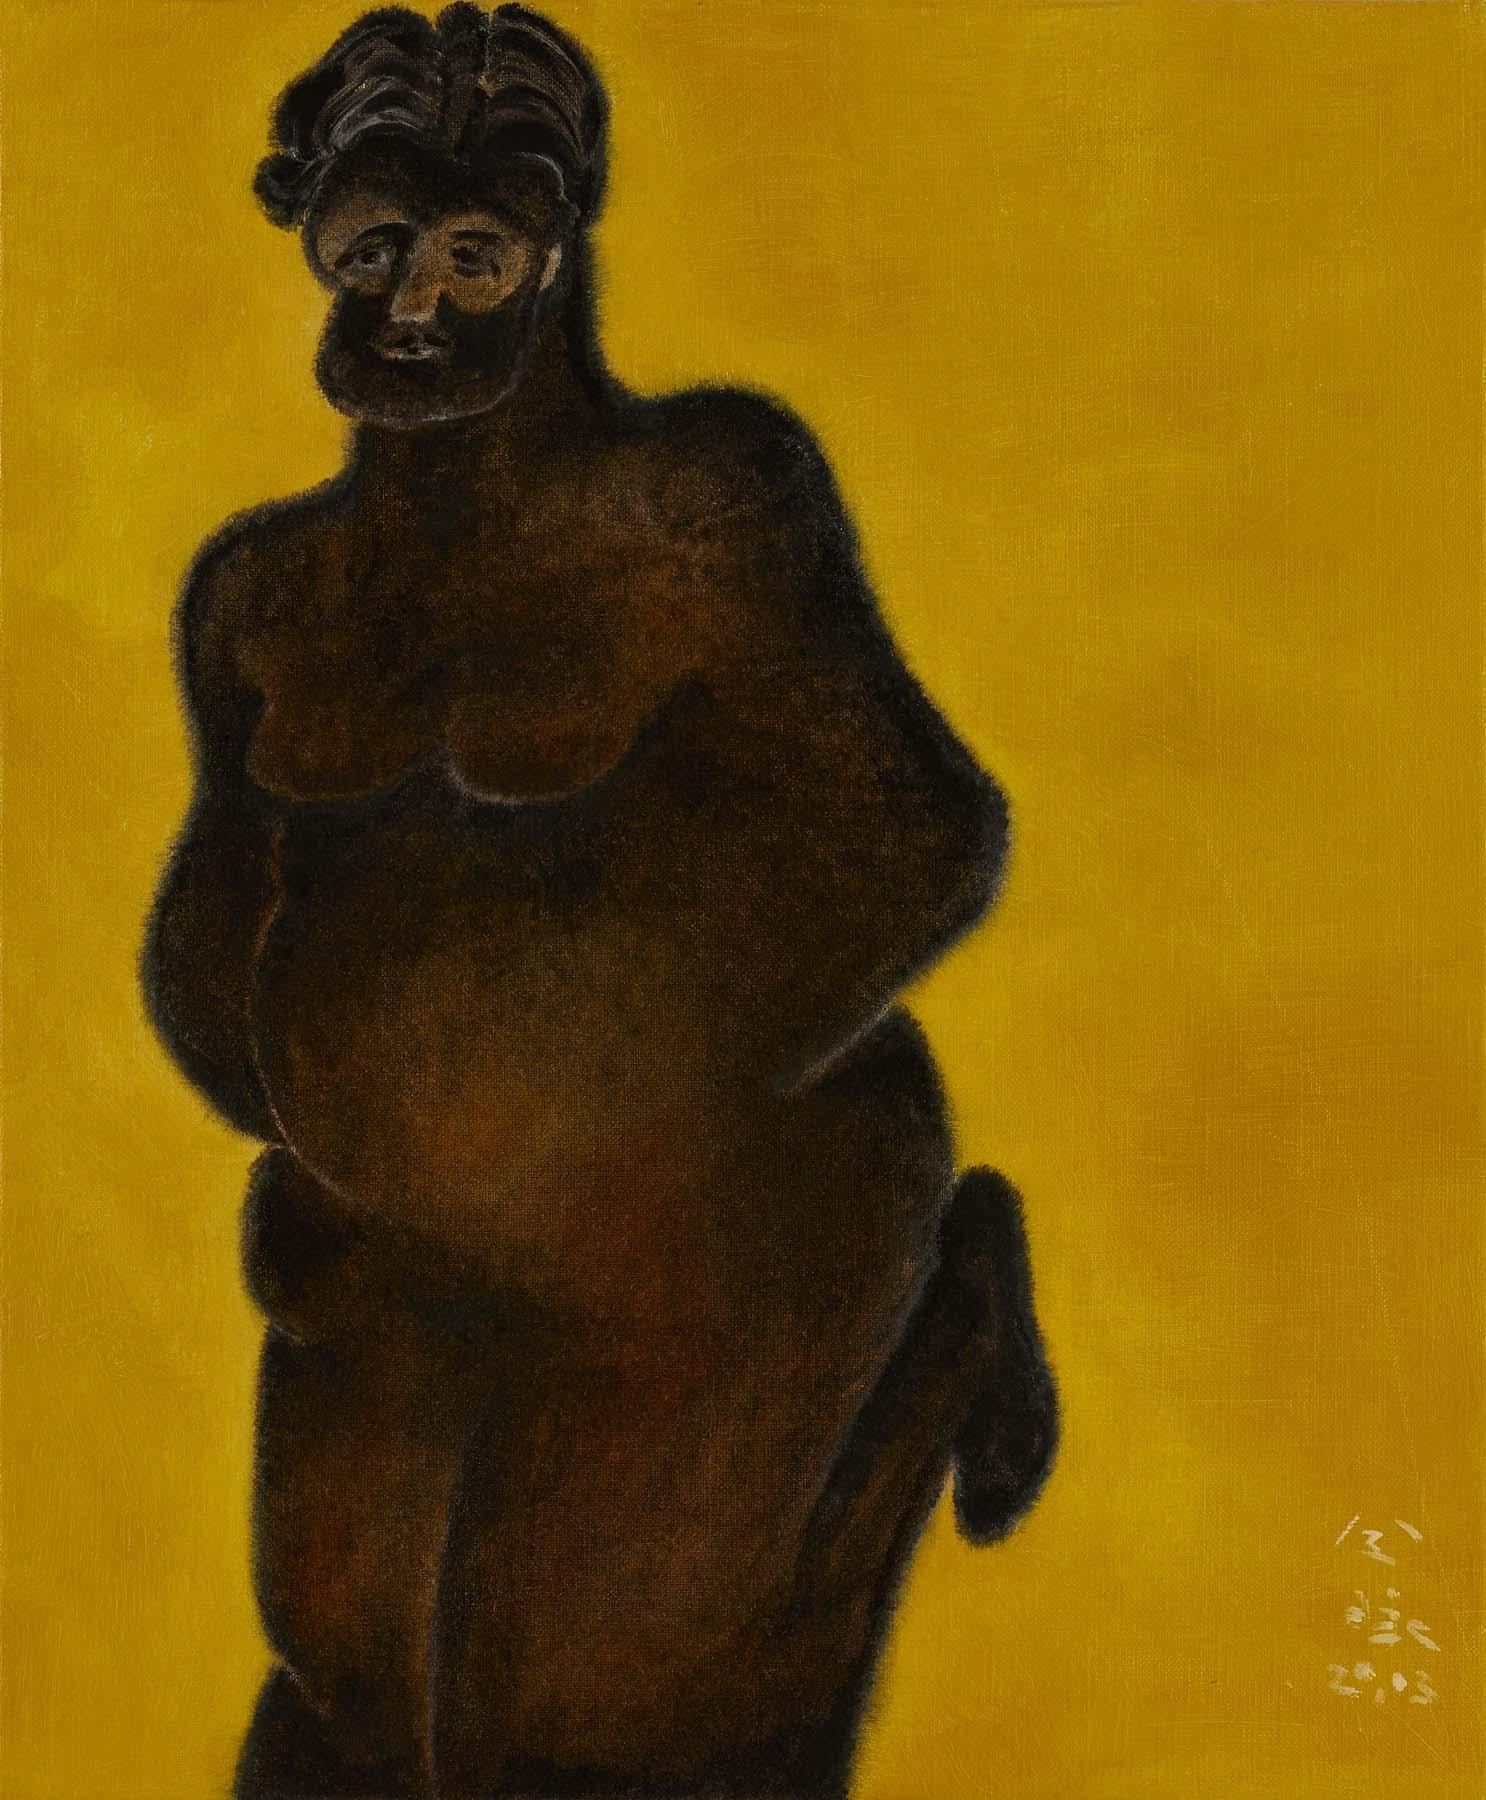 令詠 Ling Yung, 勞倫斯先生 mr. lawrence, 2020, 畫布油彩 oil on canvas, 60 x 50 cm